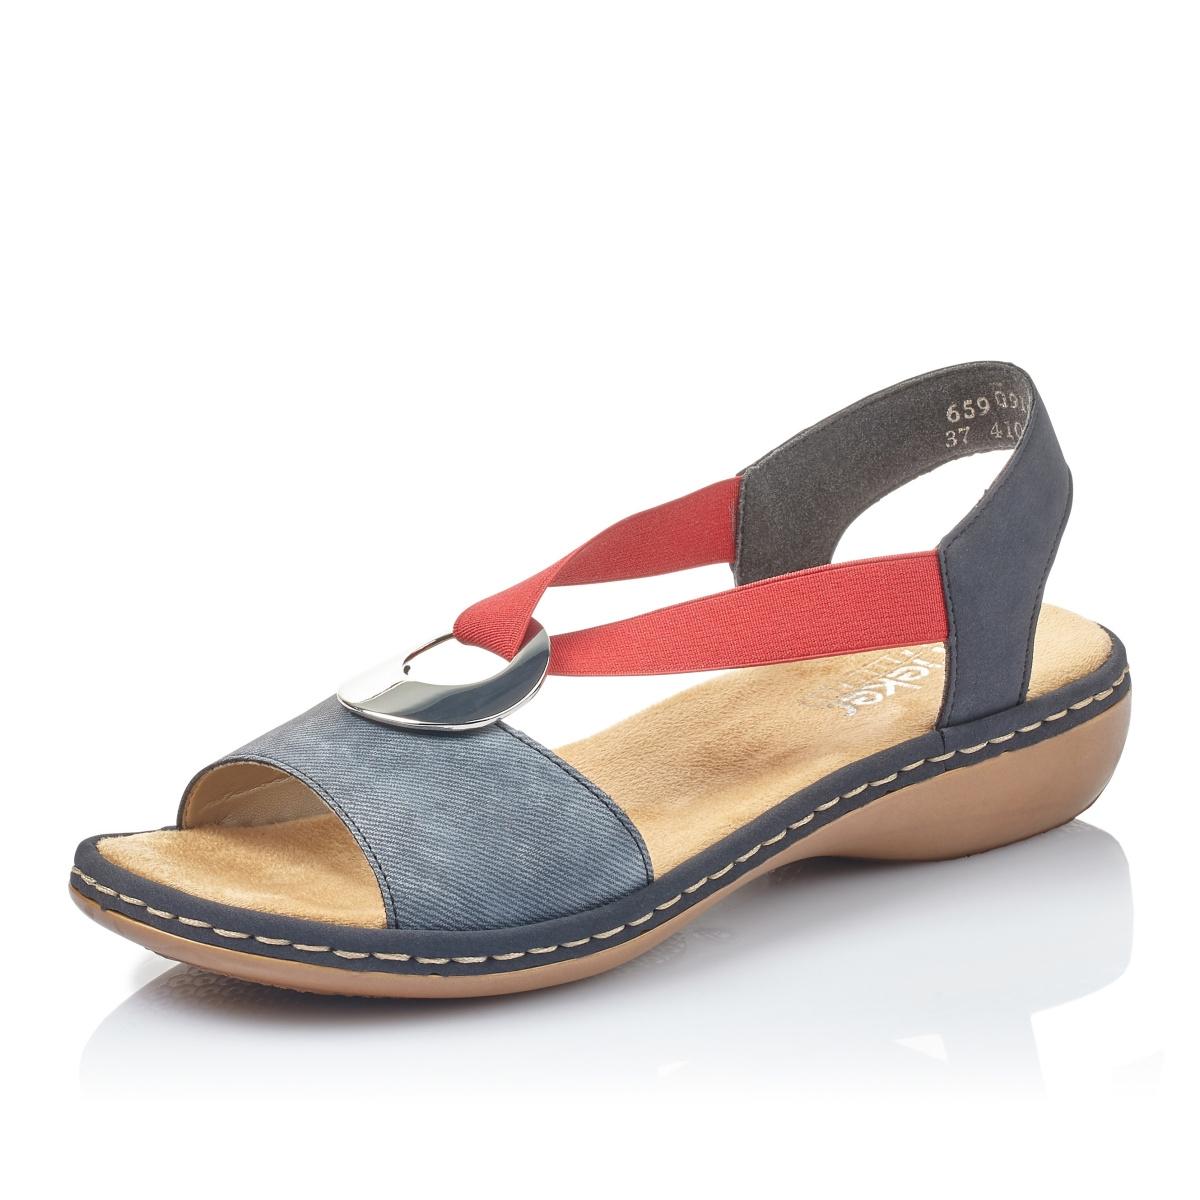 d0a07b11180b detail Dámska obuv RIEKER br 659Q9-14 BLAU KOMBI ...